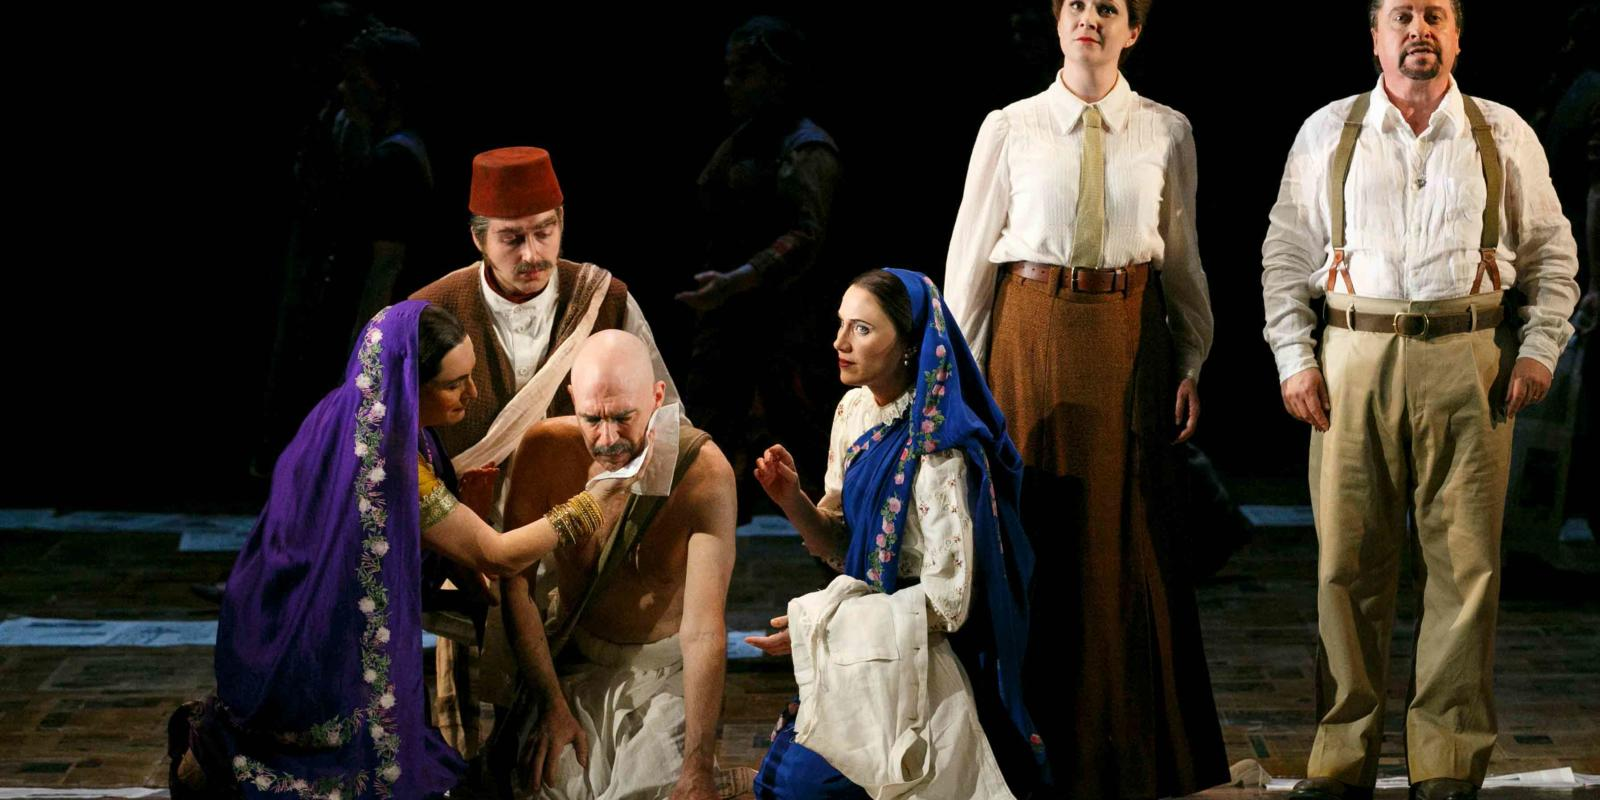 An image of Janis Kelly, Nicholas Masters, Alan Oke, Stephanie Marshall, Clare Eggington and Nicholas Folwell in Phelim McDermott's 2013 production of Satyagraha